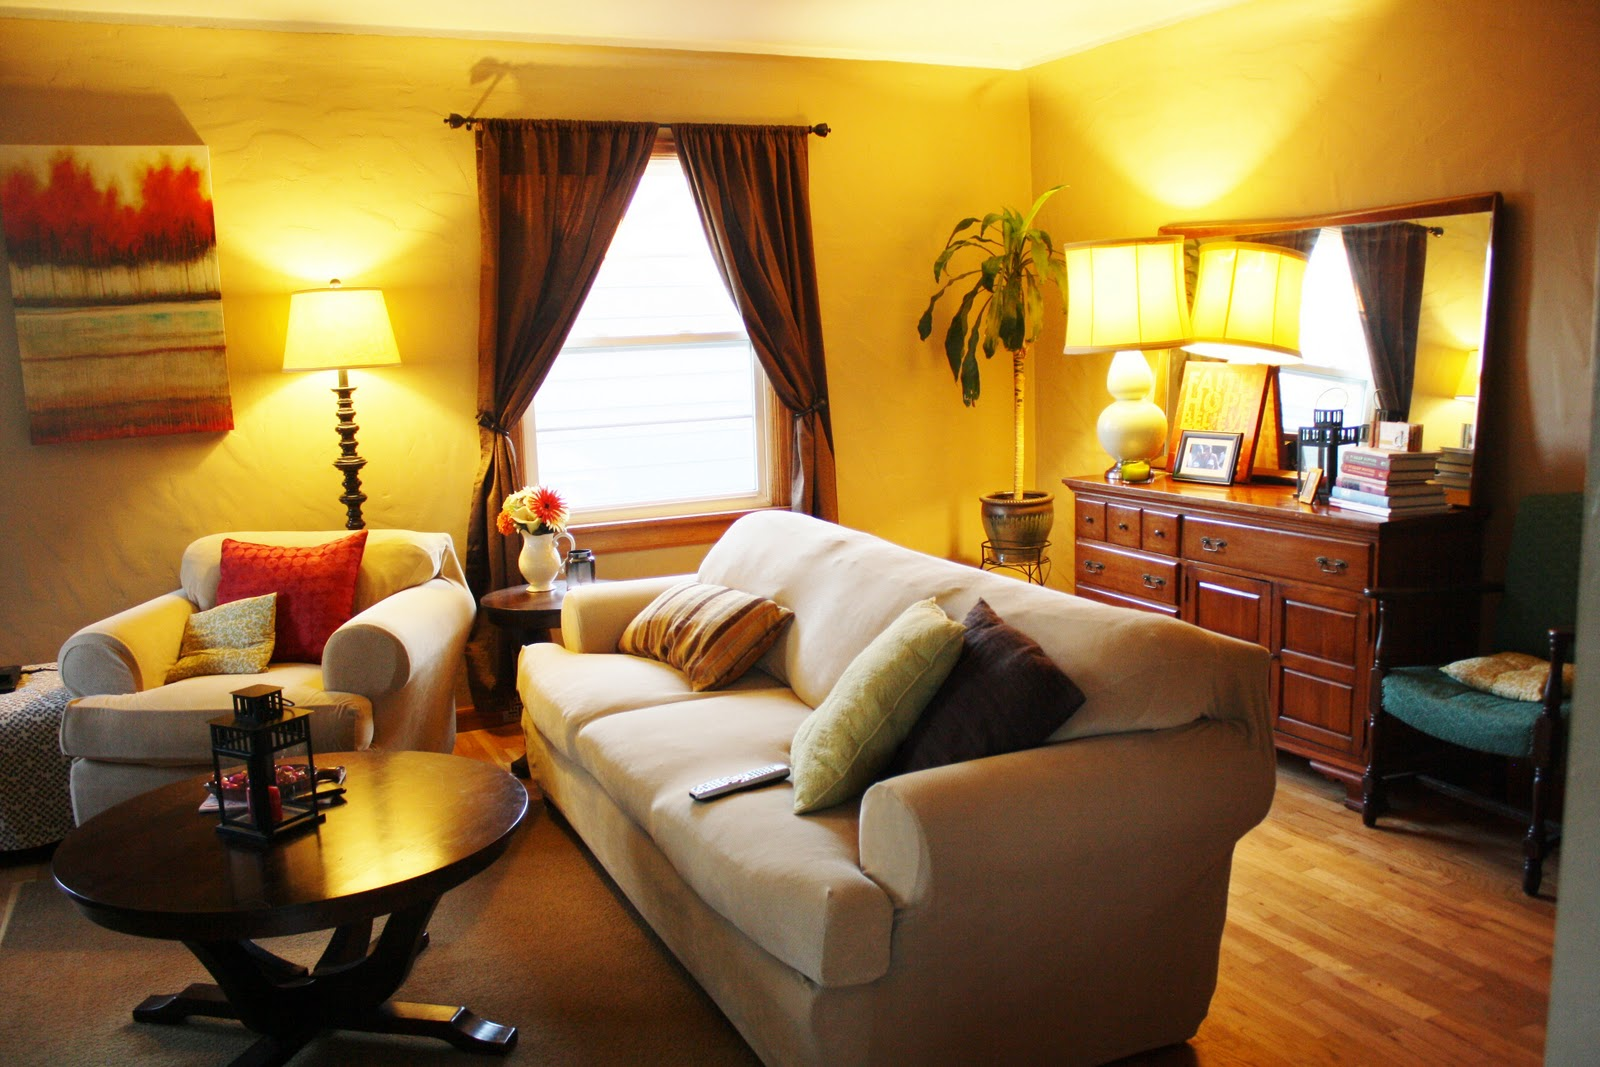 Upgrade Living Room: Domestically Dobson: Living Room Upgrade